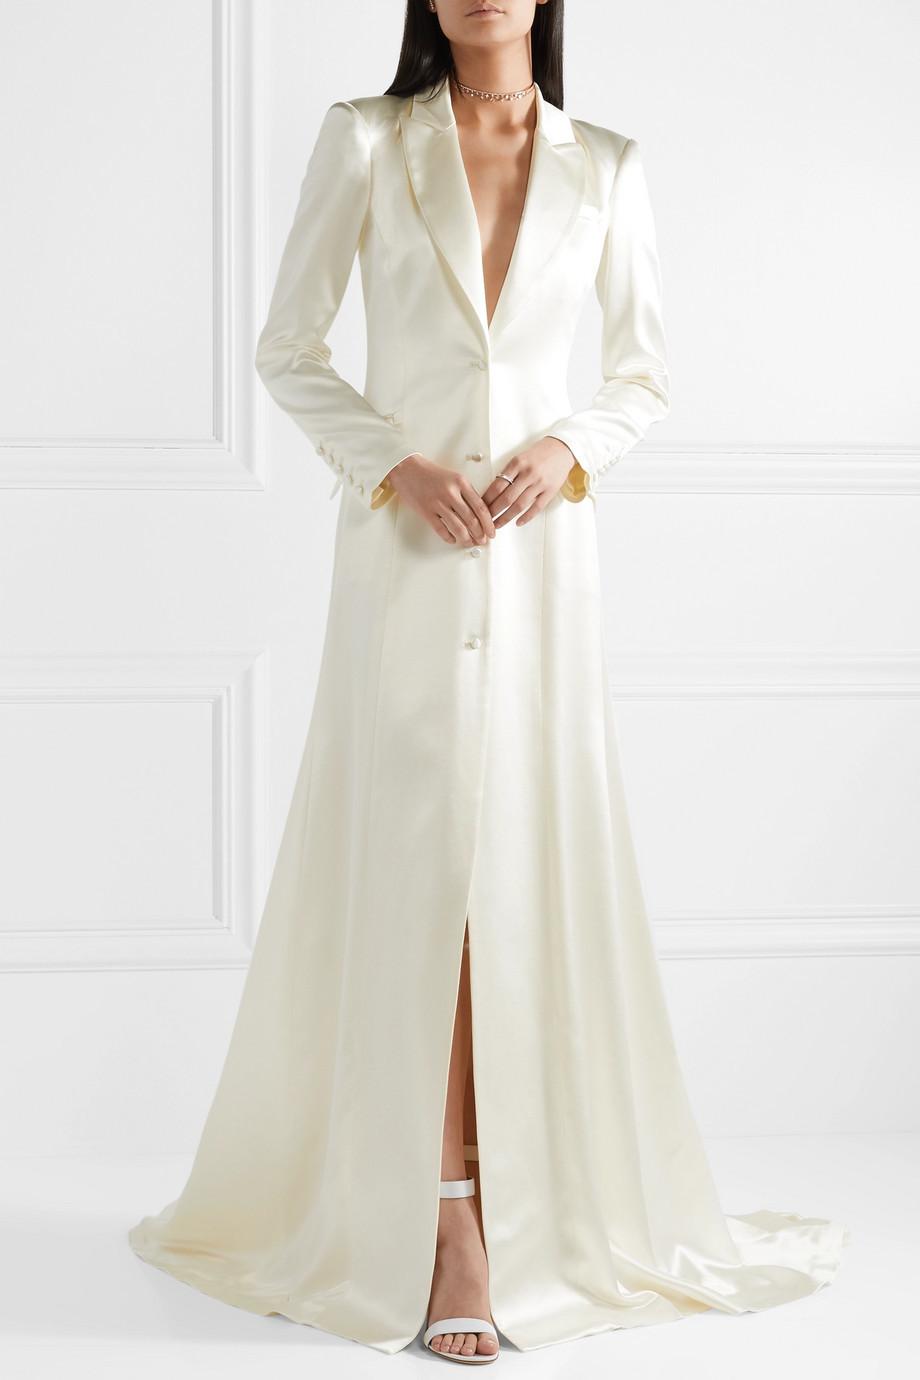 Vestido tipo abrigo, de Danielle Frankel.